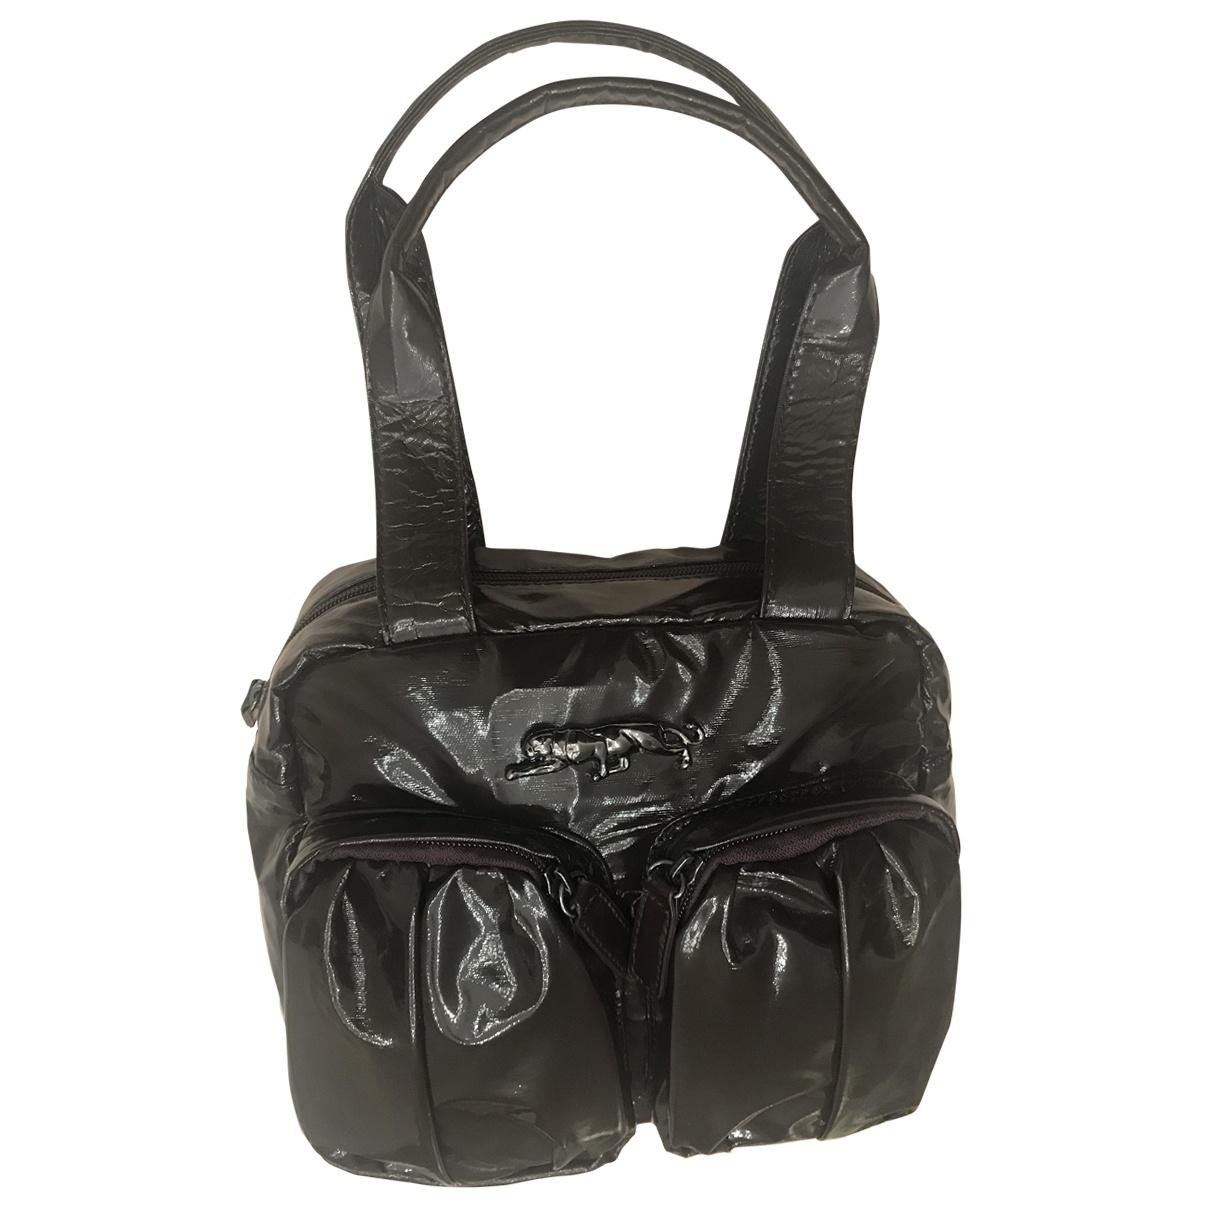 Krizia \N Brown handbag for Women \N